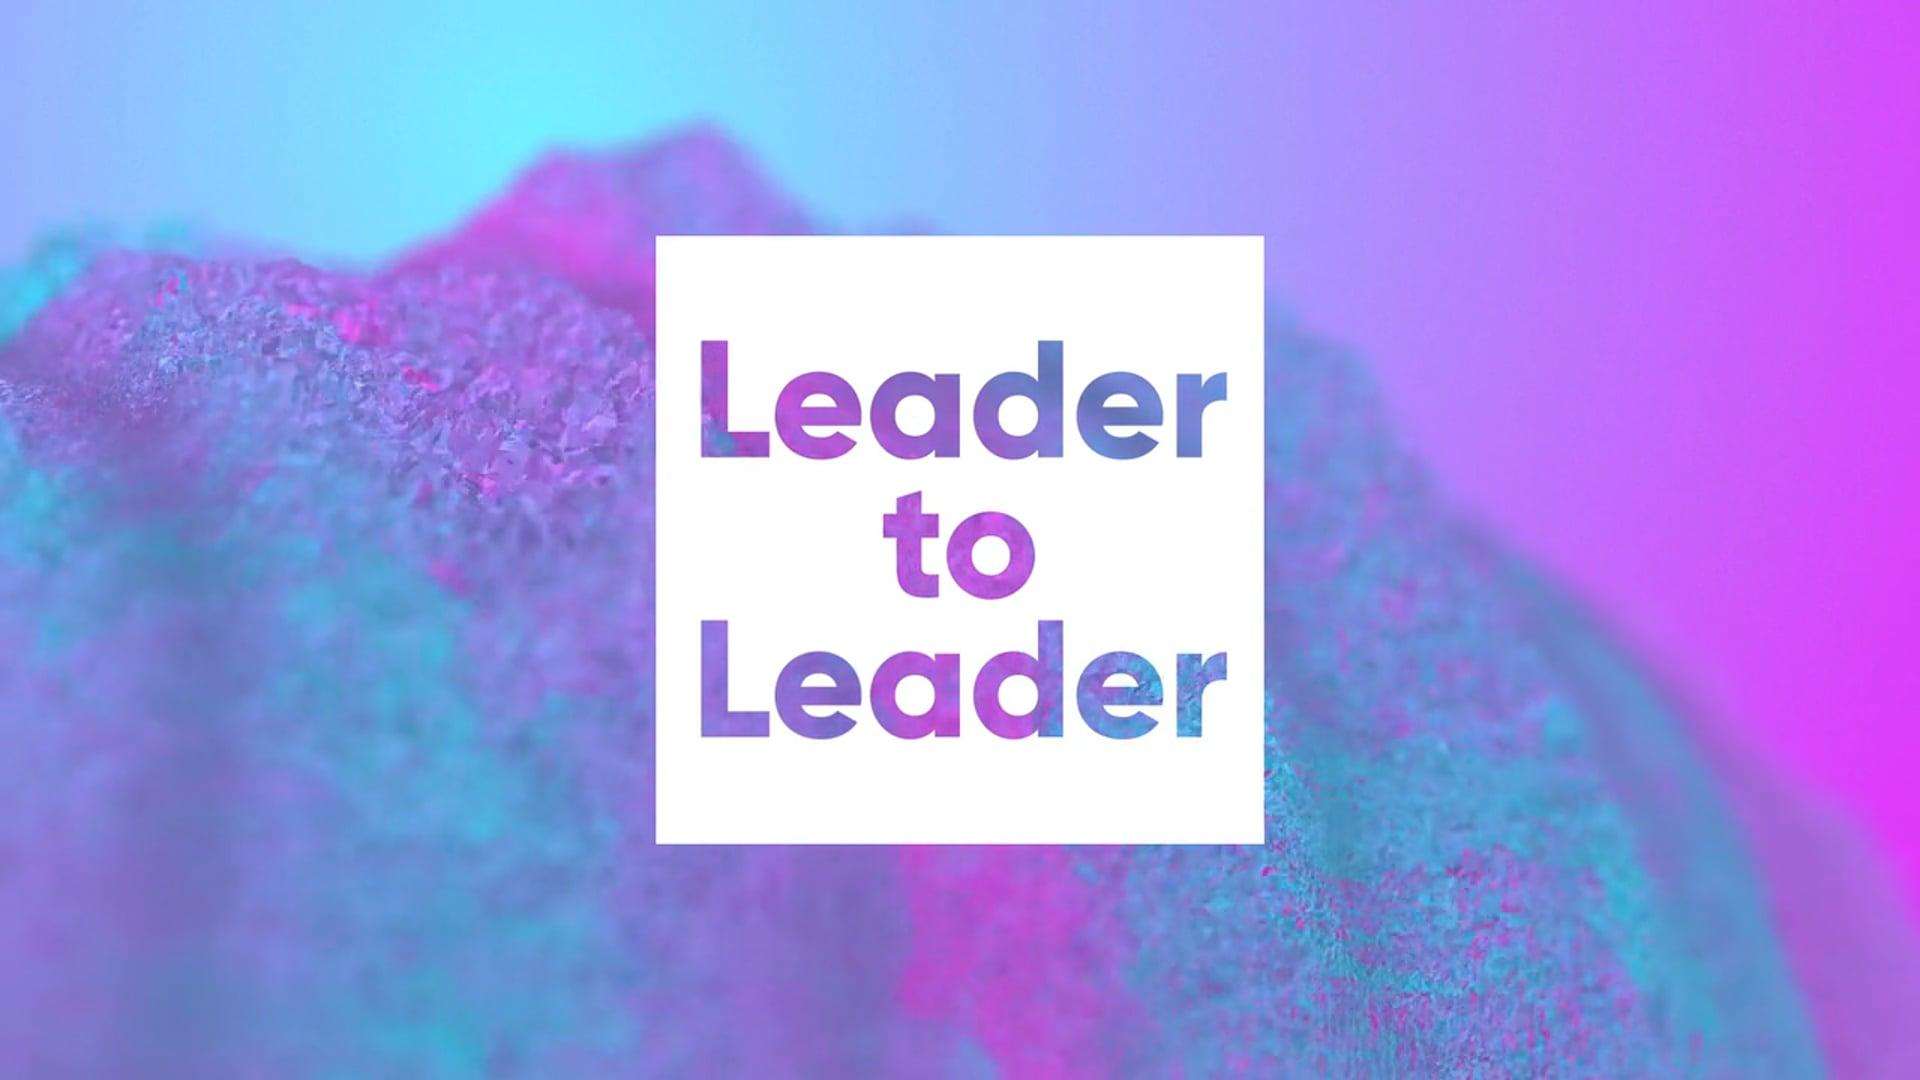 #PurpleLightUp 2021 | Leader to Leader